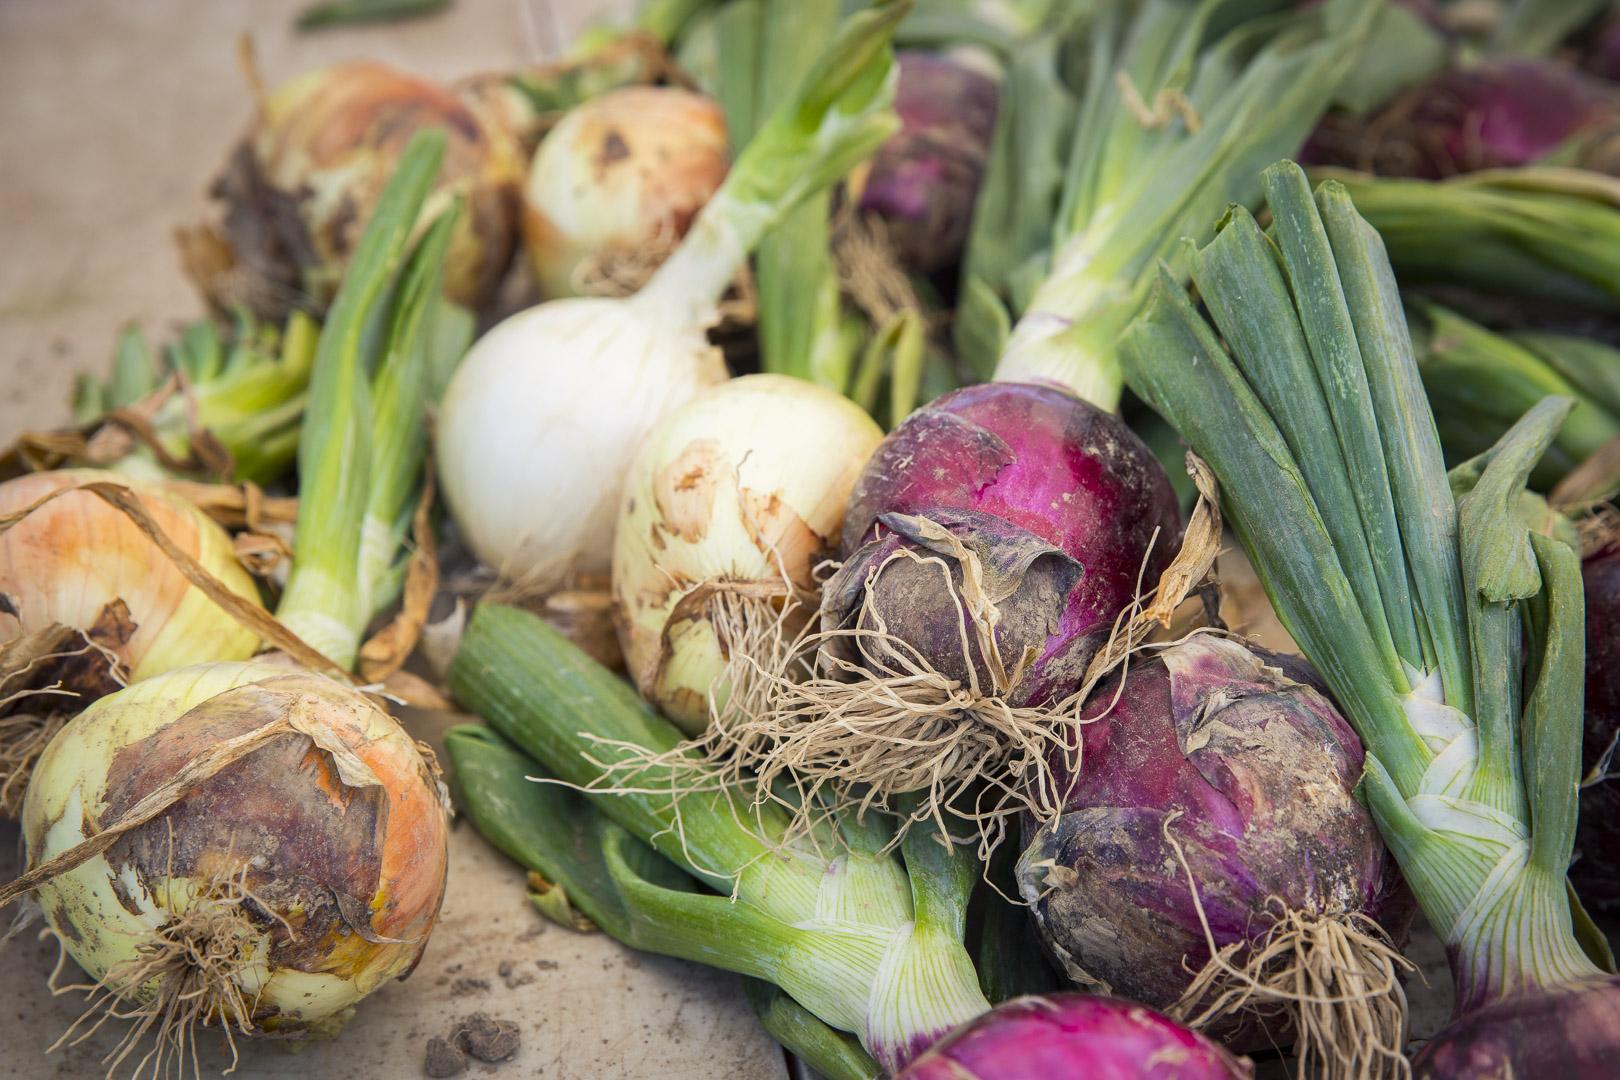 A Mix of Onions